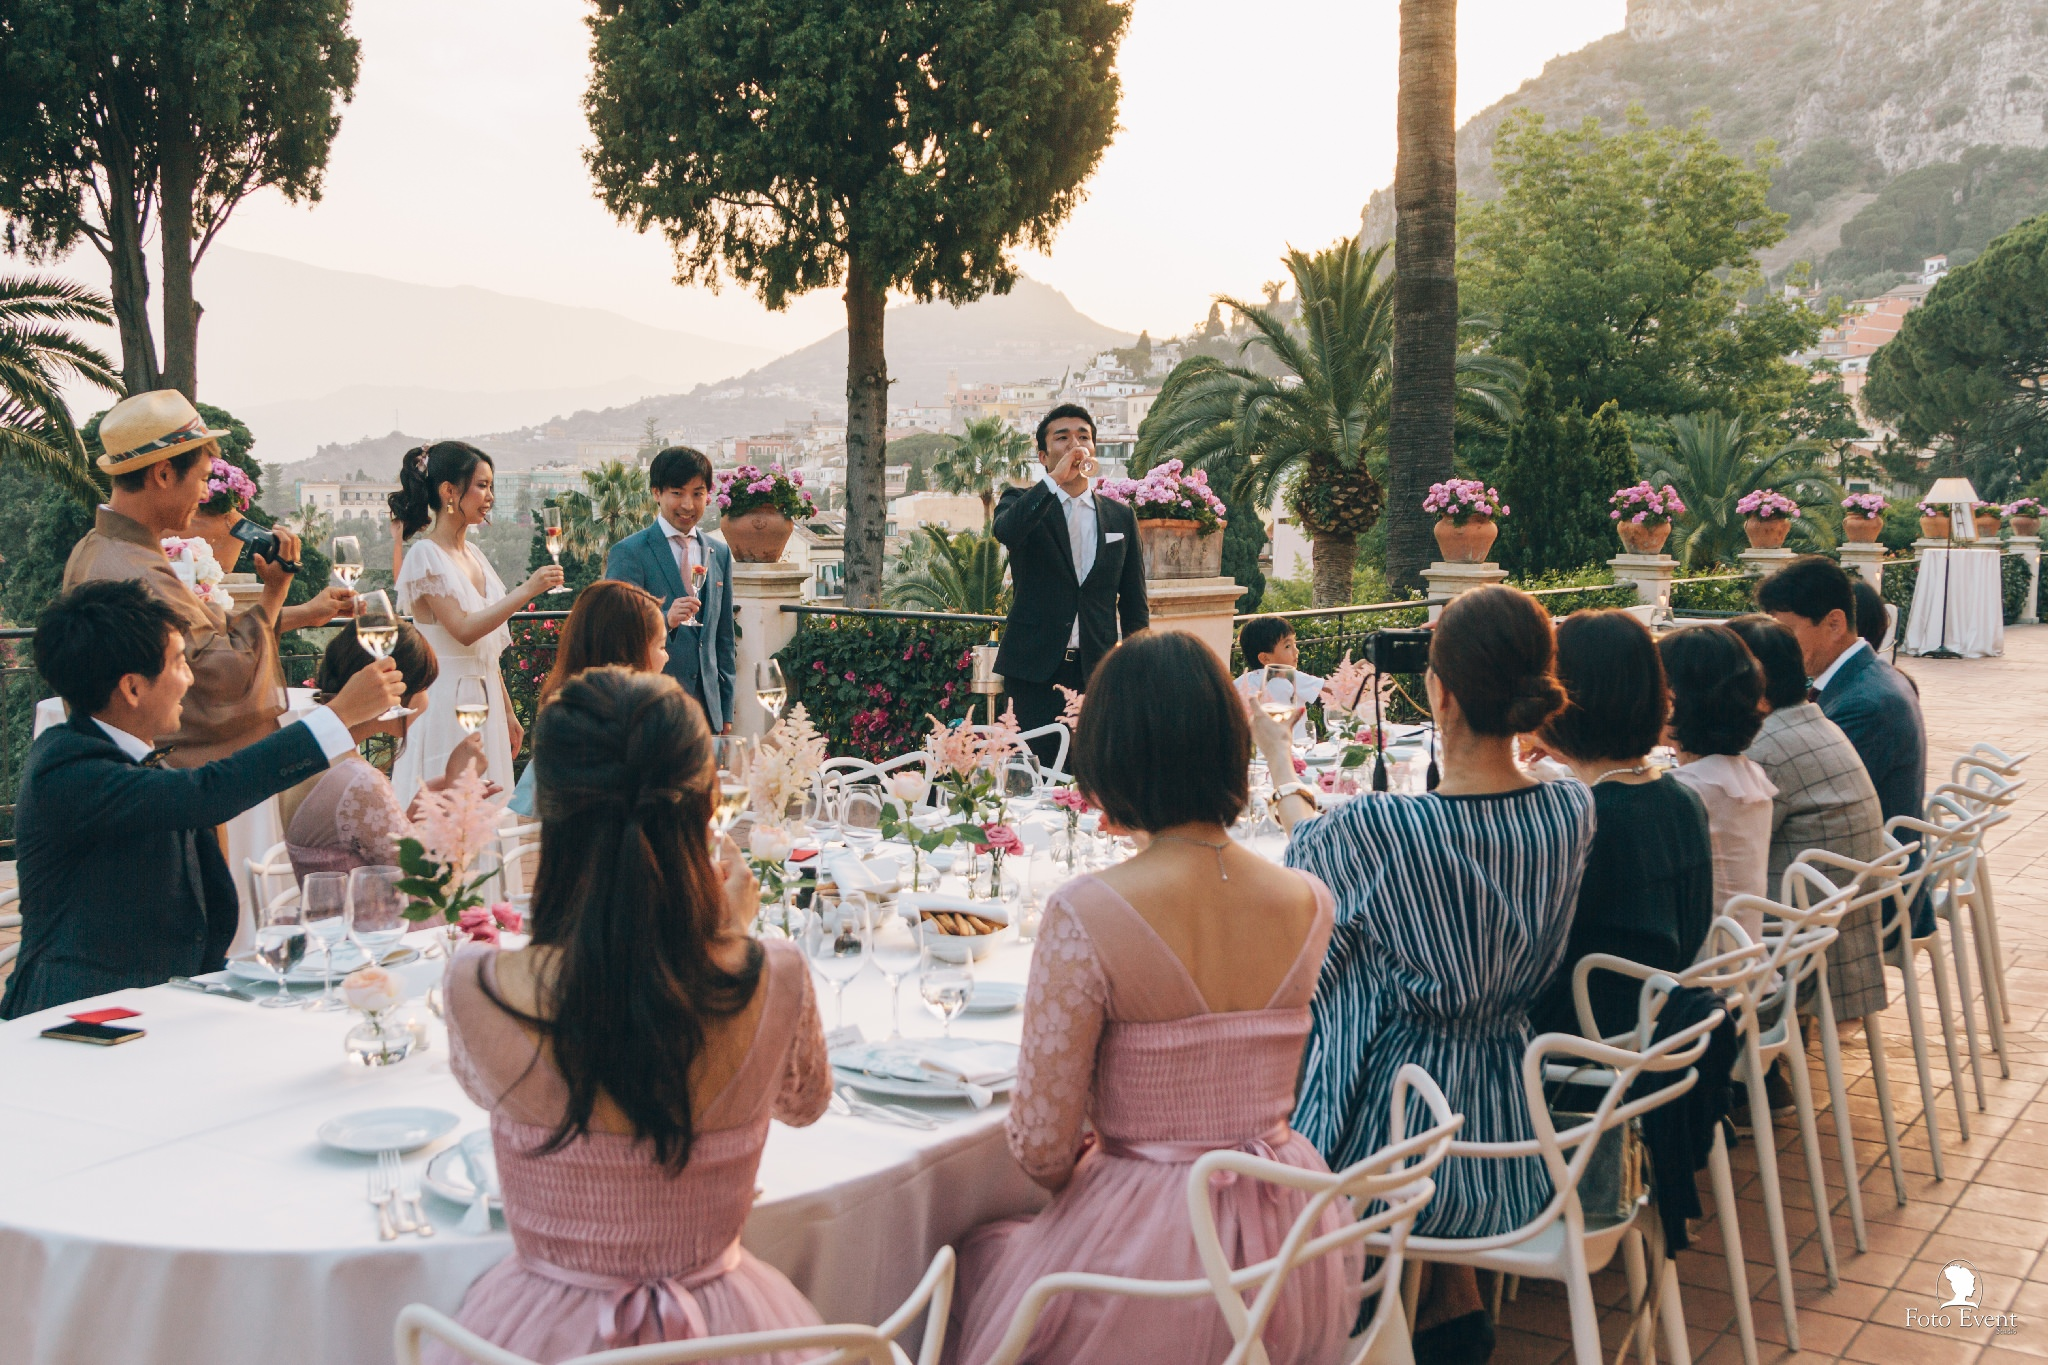 477-2019-06-14-Wedding-Yume-e-Makoto-Isee-7DL-522